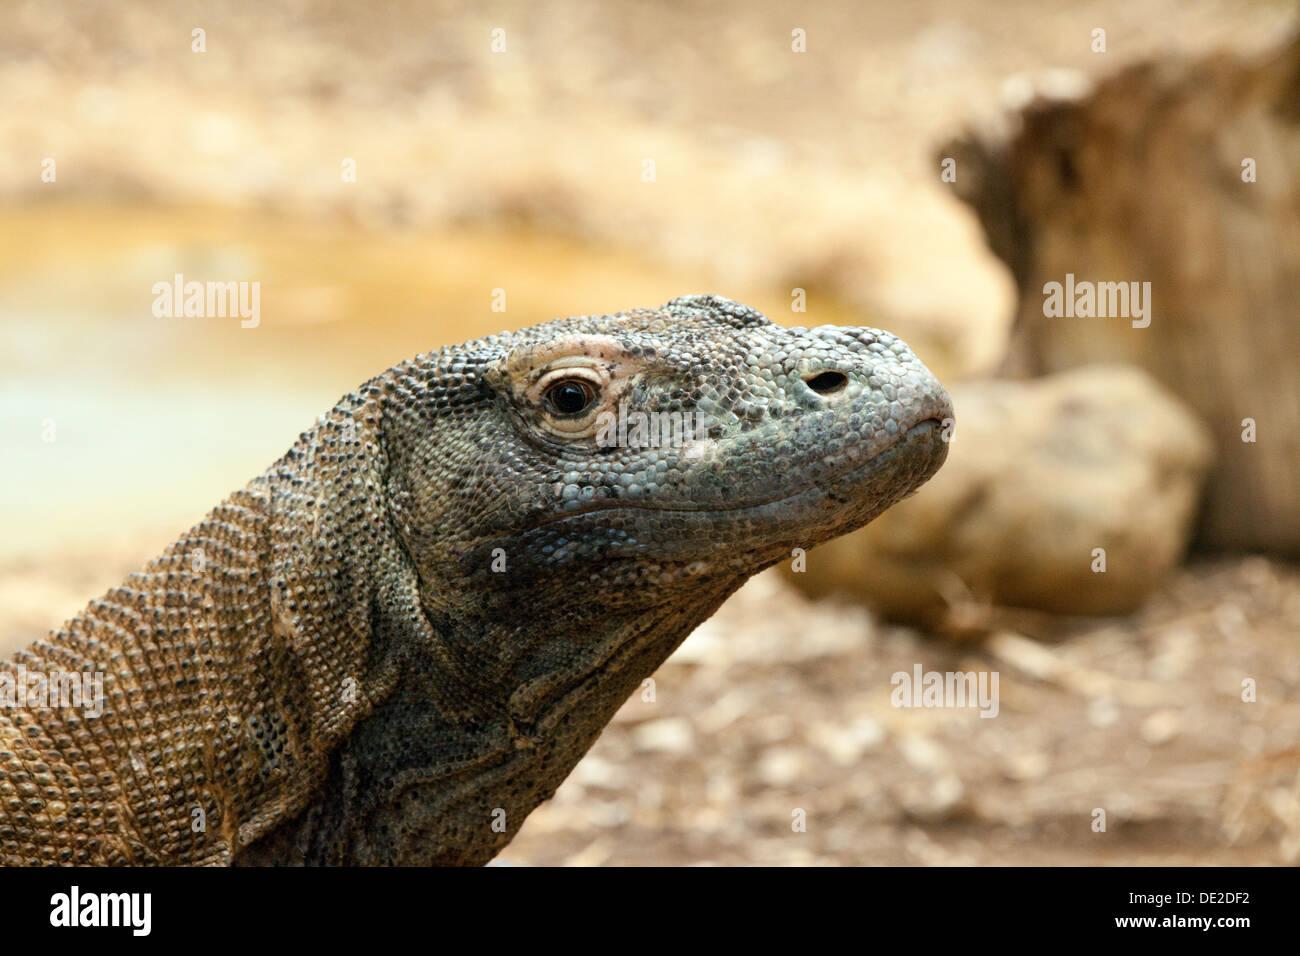 Komodo Dragon - Varanus Komodoensis, auch bekannt als Komodo Monitor, ein großes Reptil; Nahaufnahme des Kopfes, Stockfoto